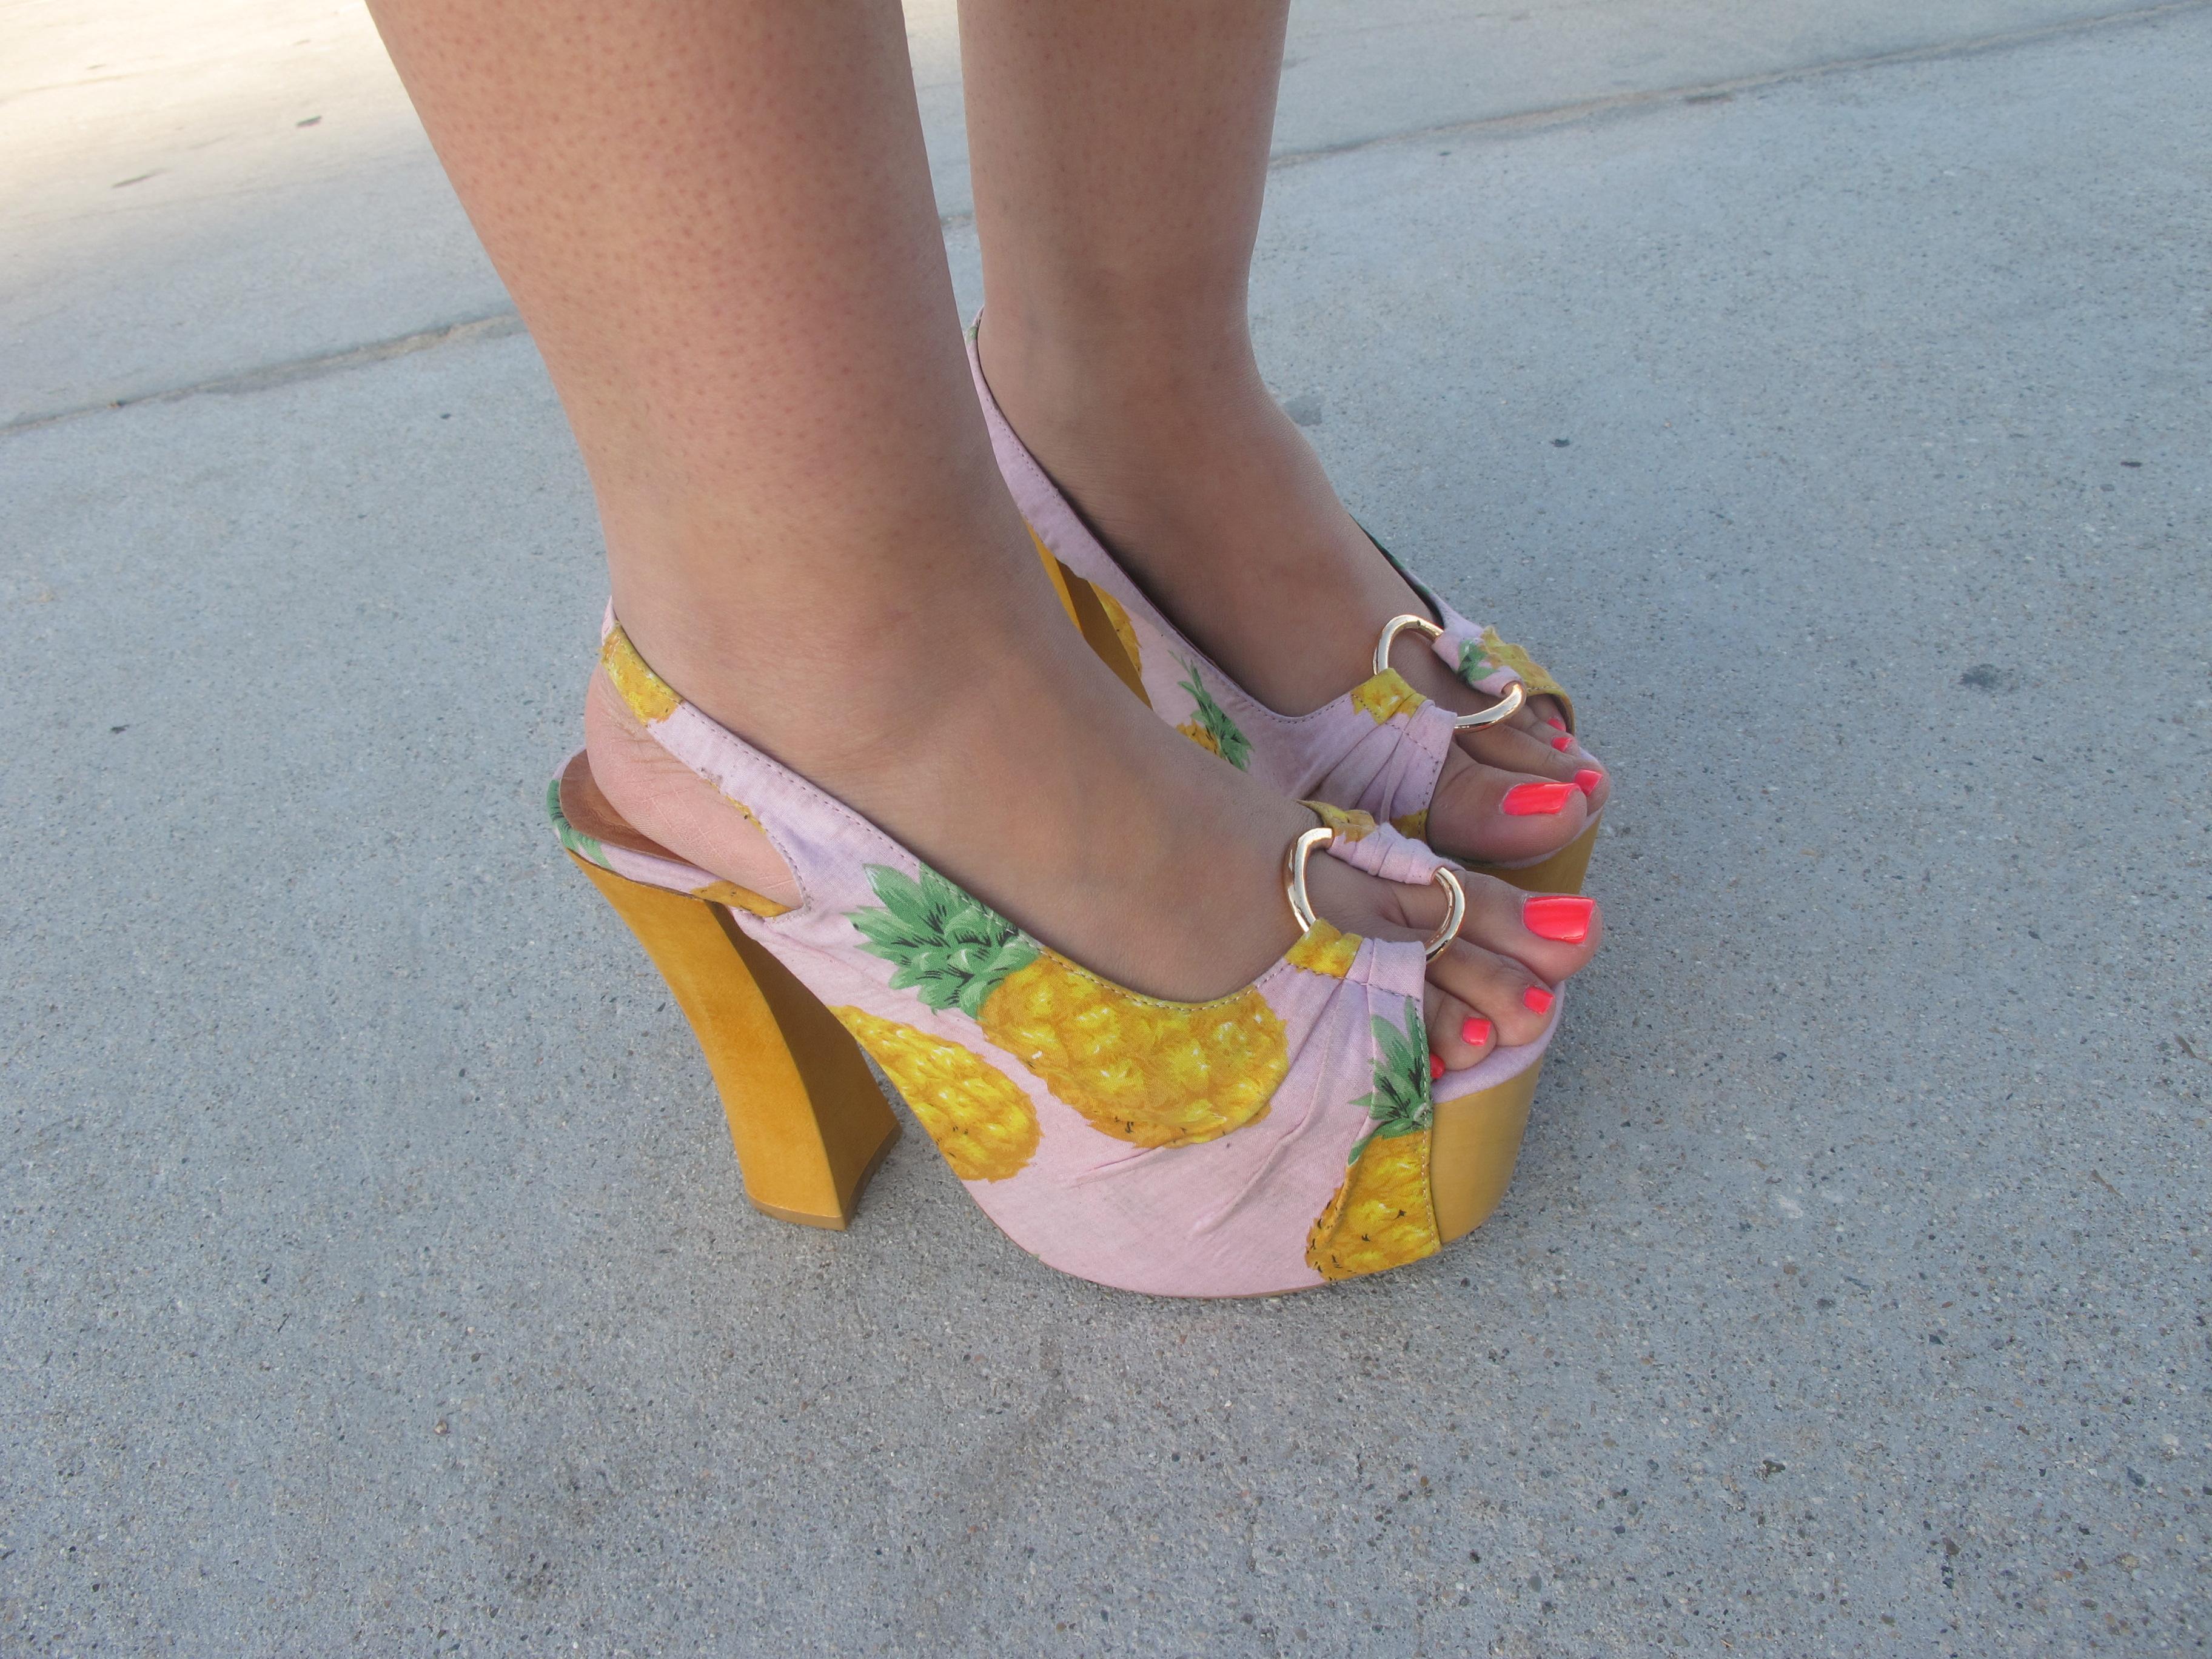 Boardwalk Comfy Shoes Store Near Me